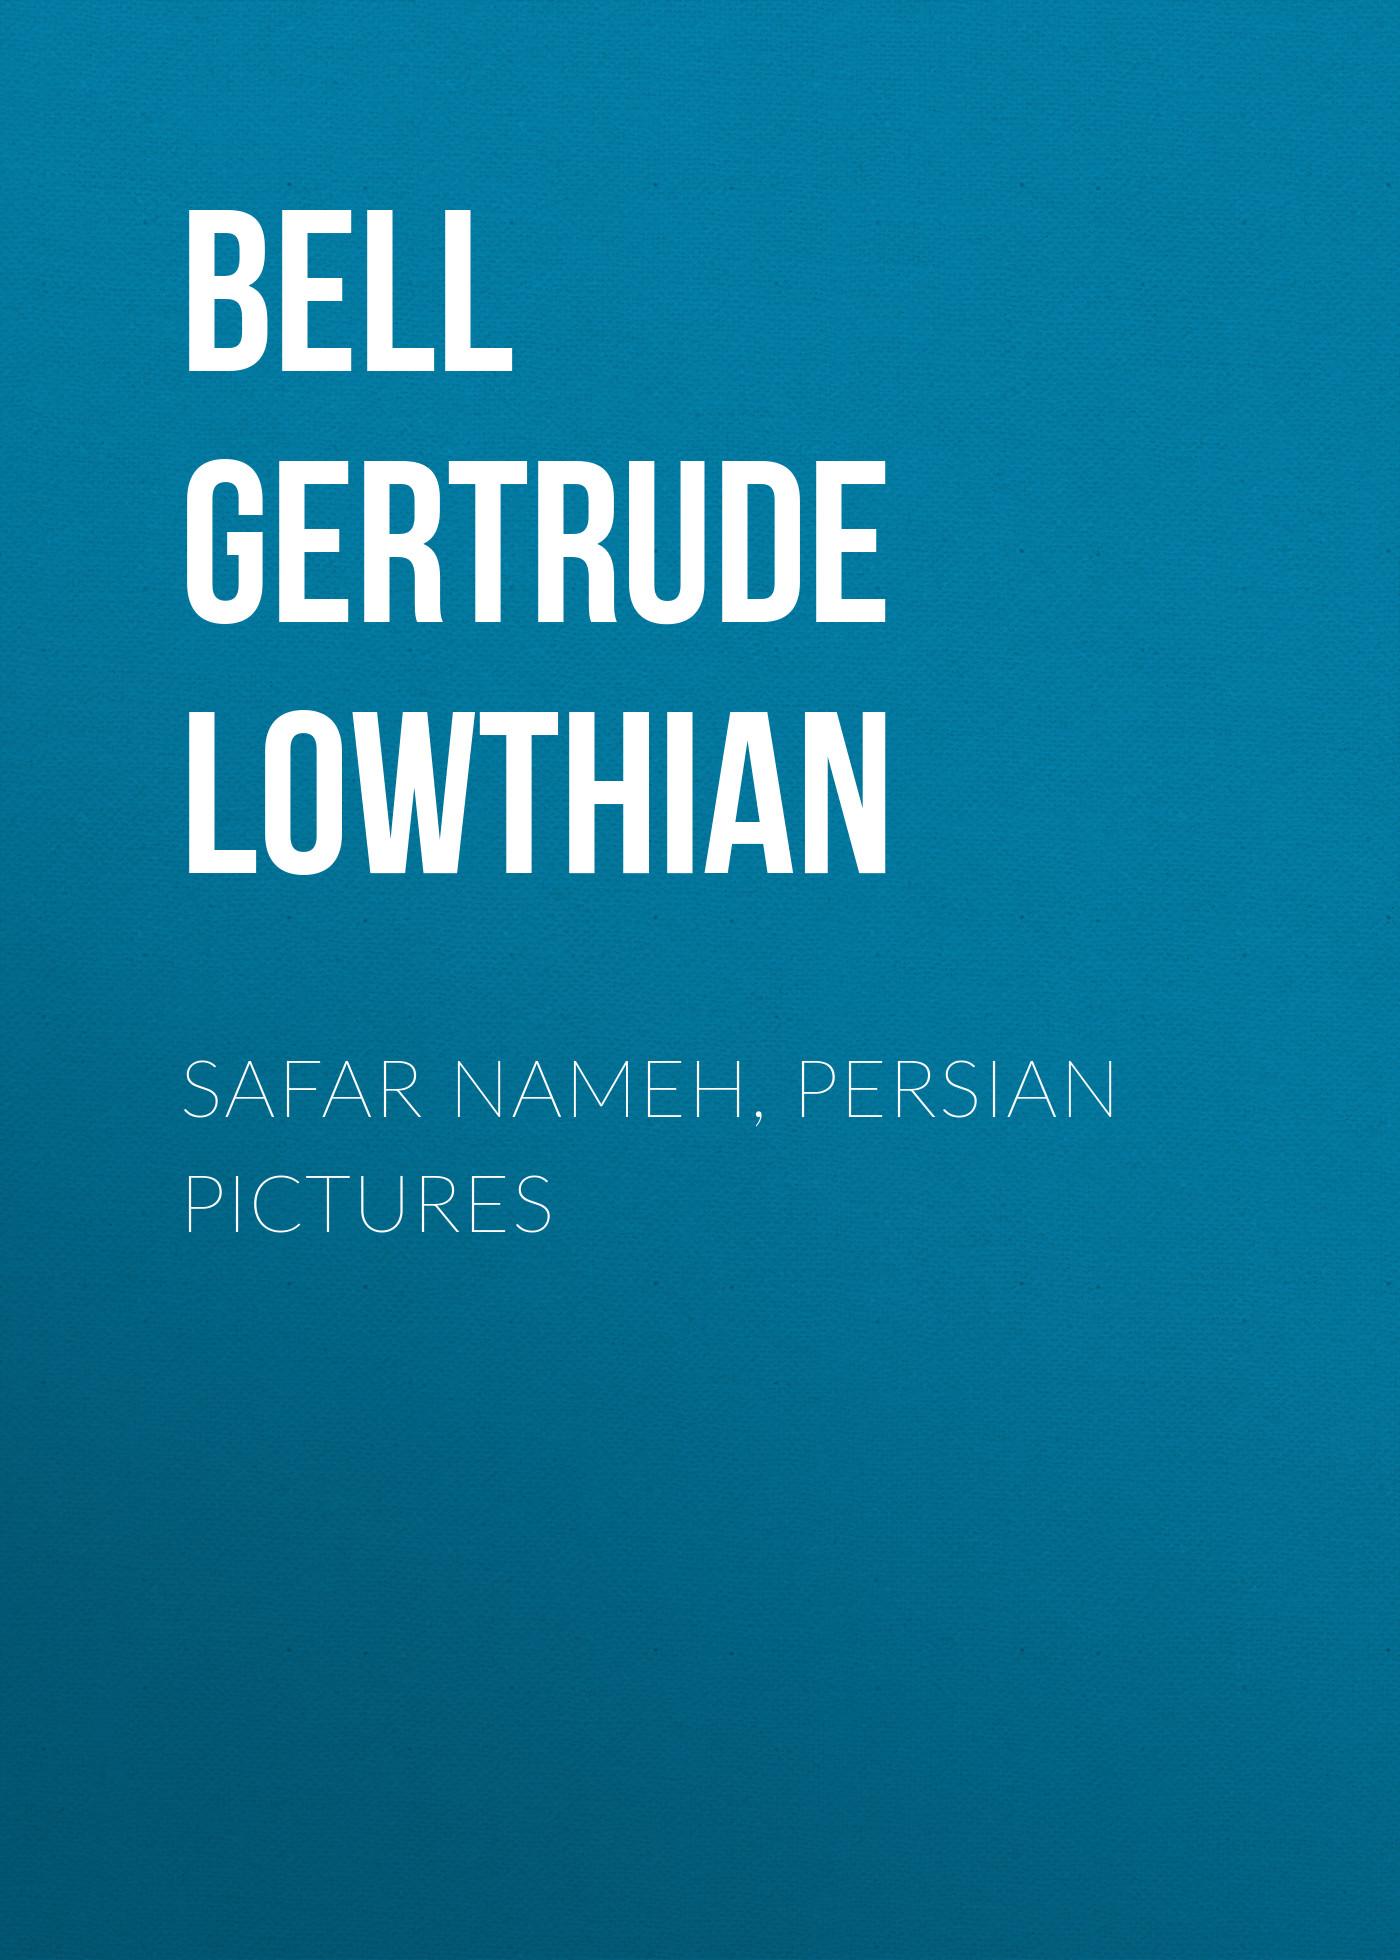 Bell Gertrude Lowthian Safar Nameh, Persian Pictures набор отвёрток persian 18 34 bs468018